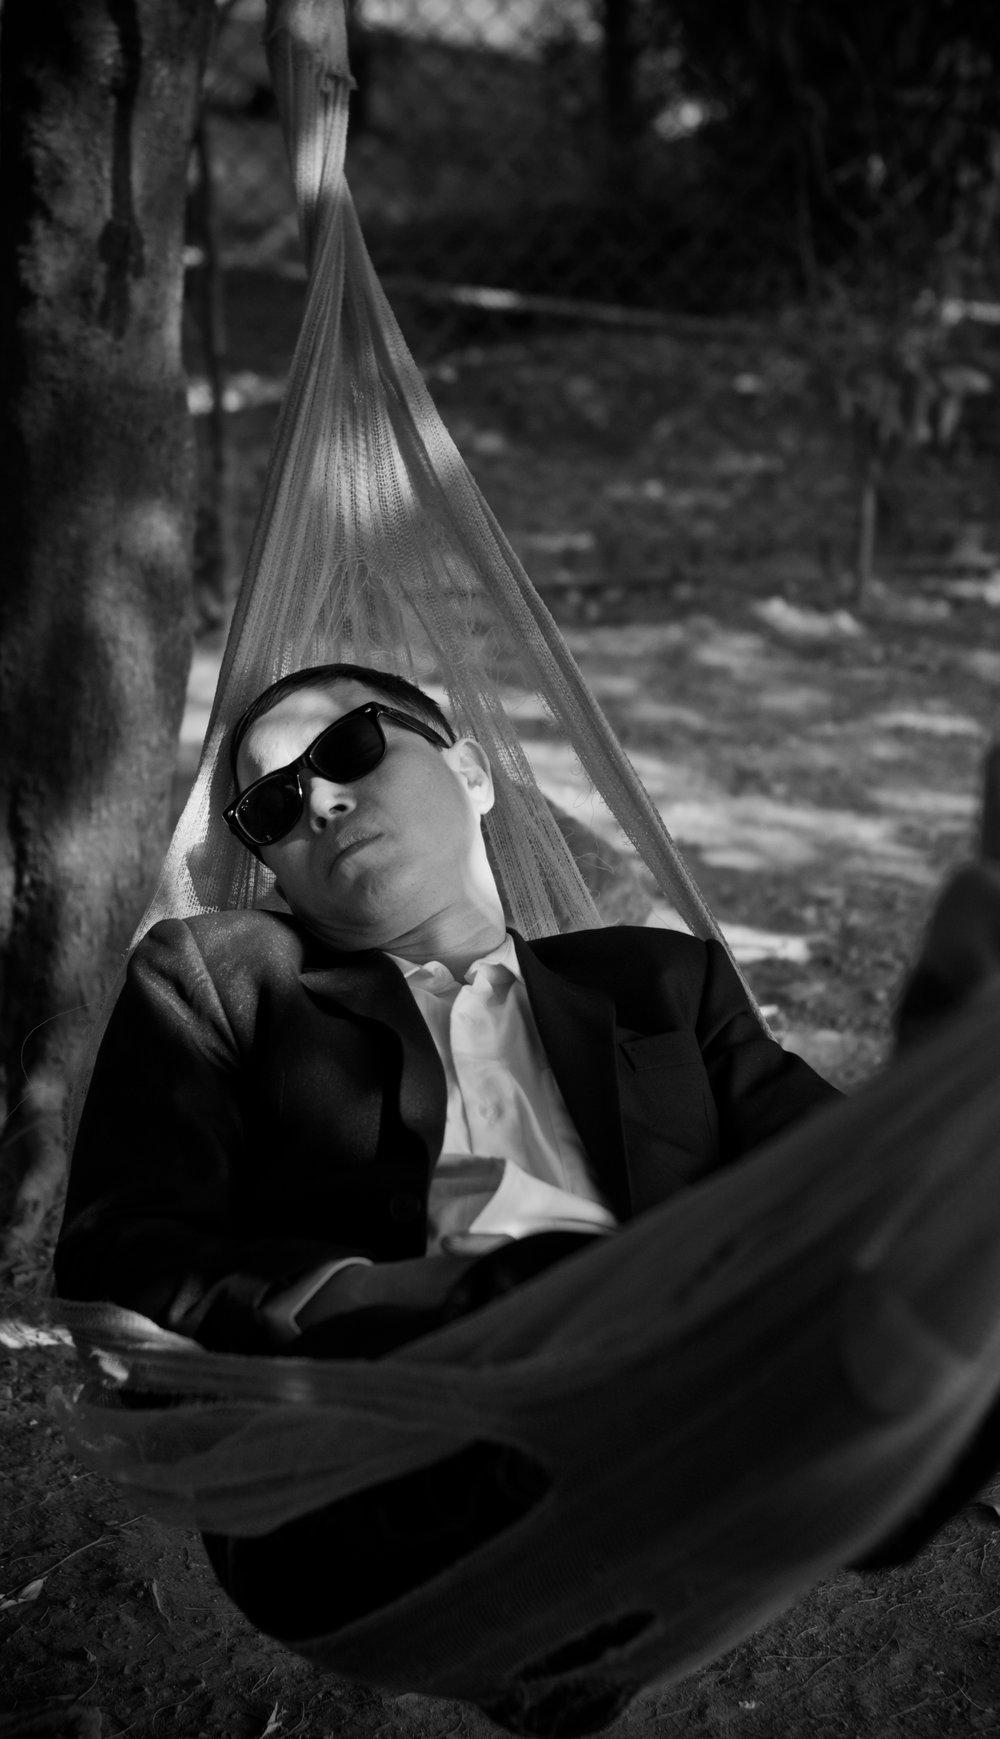 Business nap